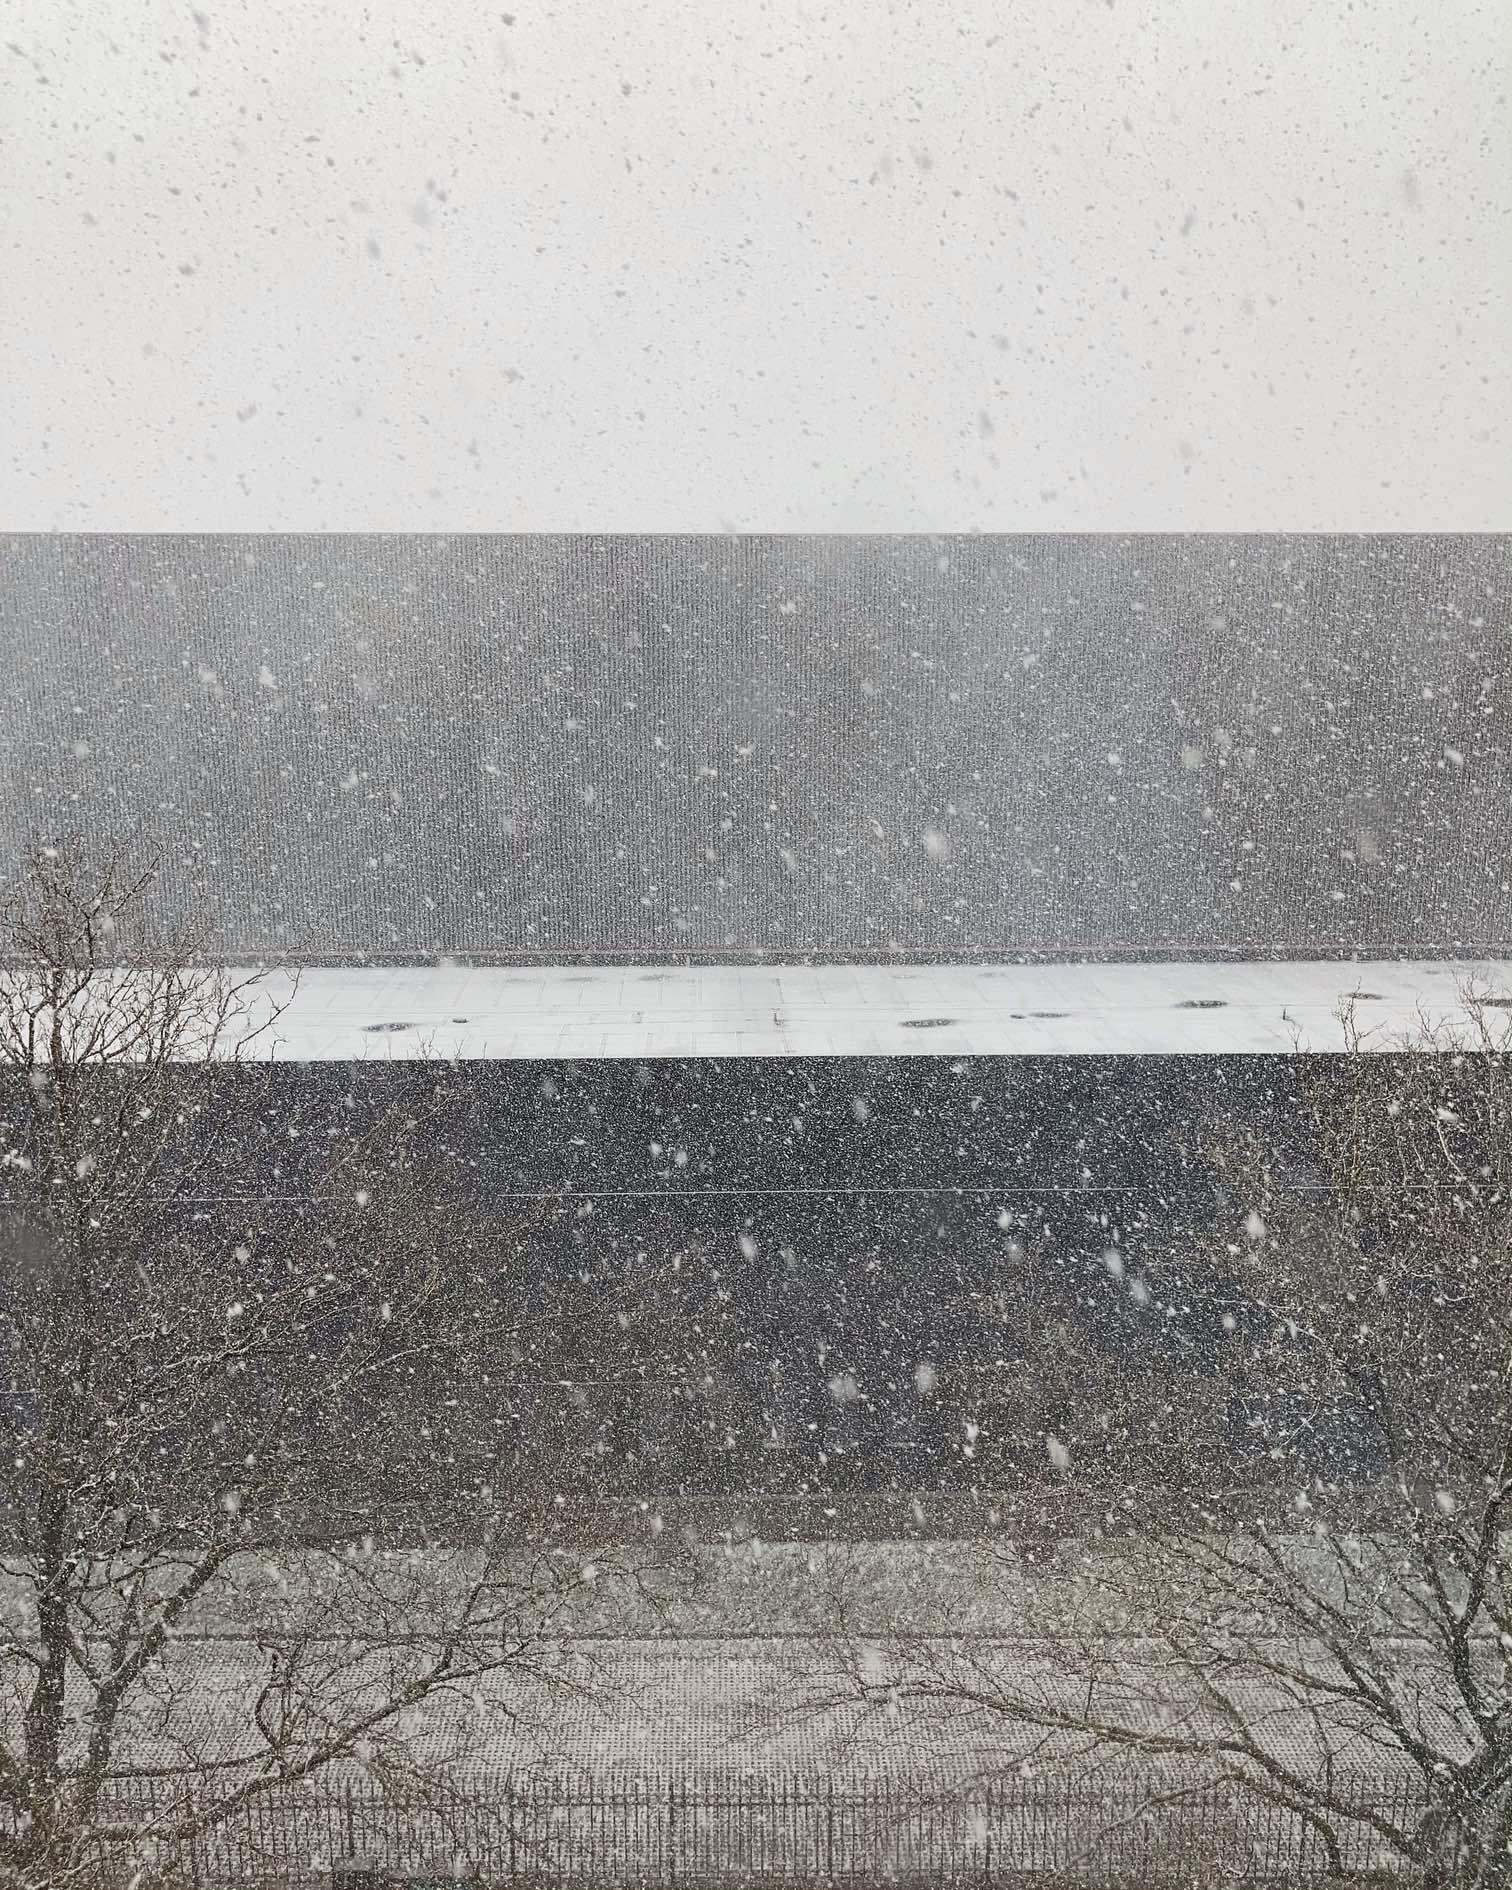 snow-falls